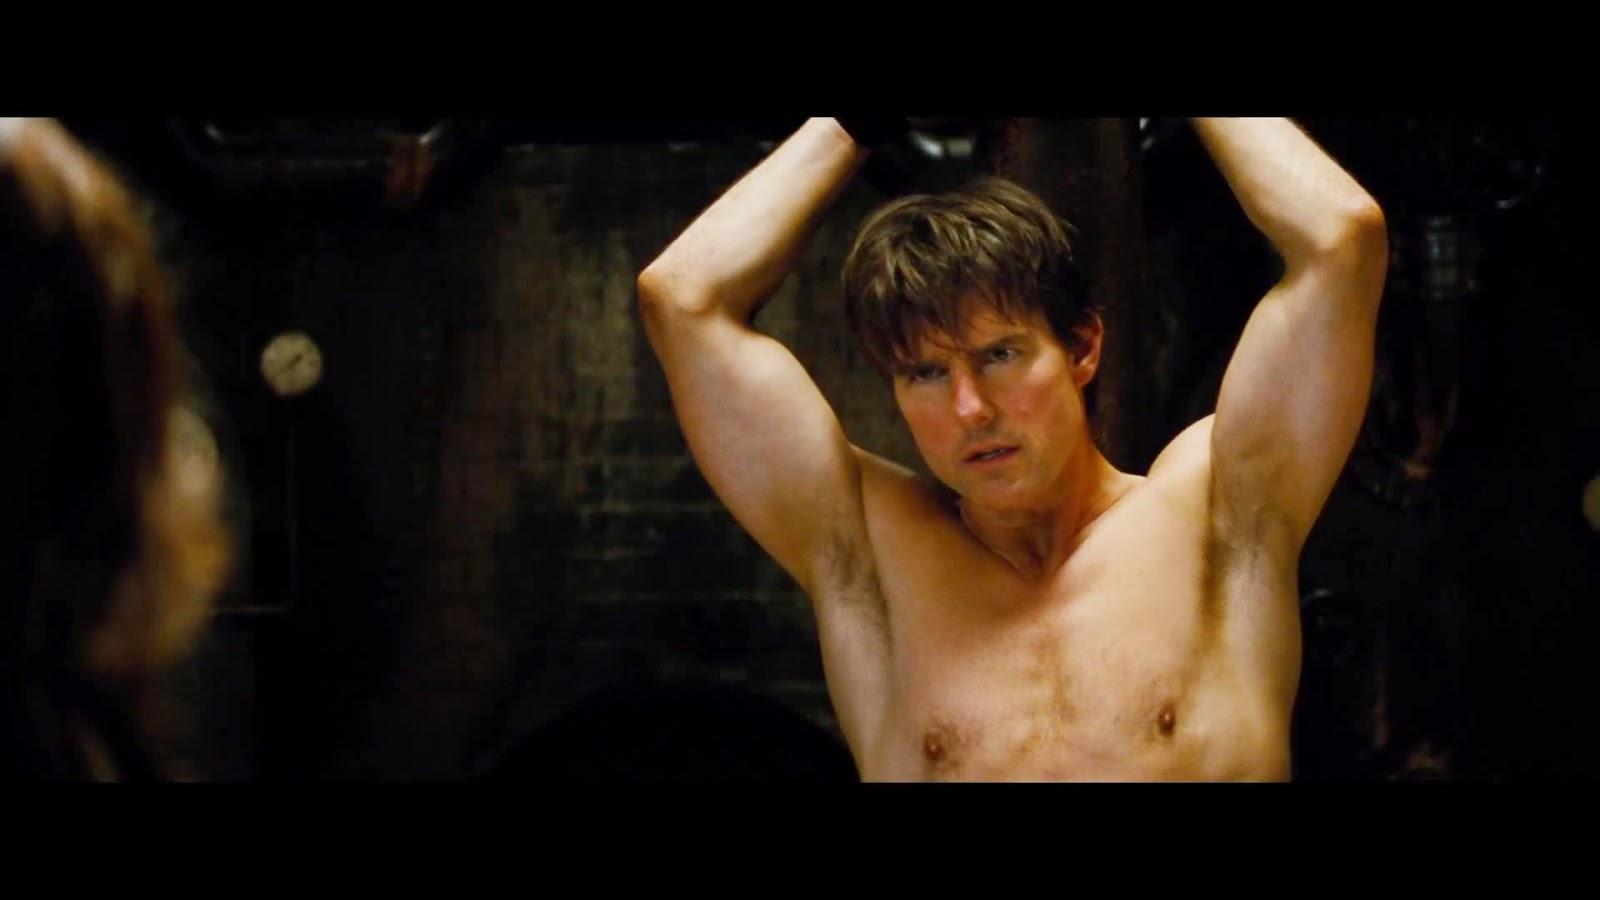 Mission Impossible 5 Movie trailer : Teaser Trailer